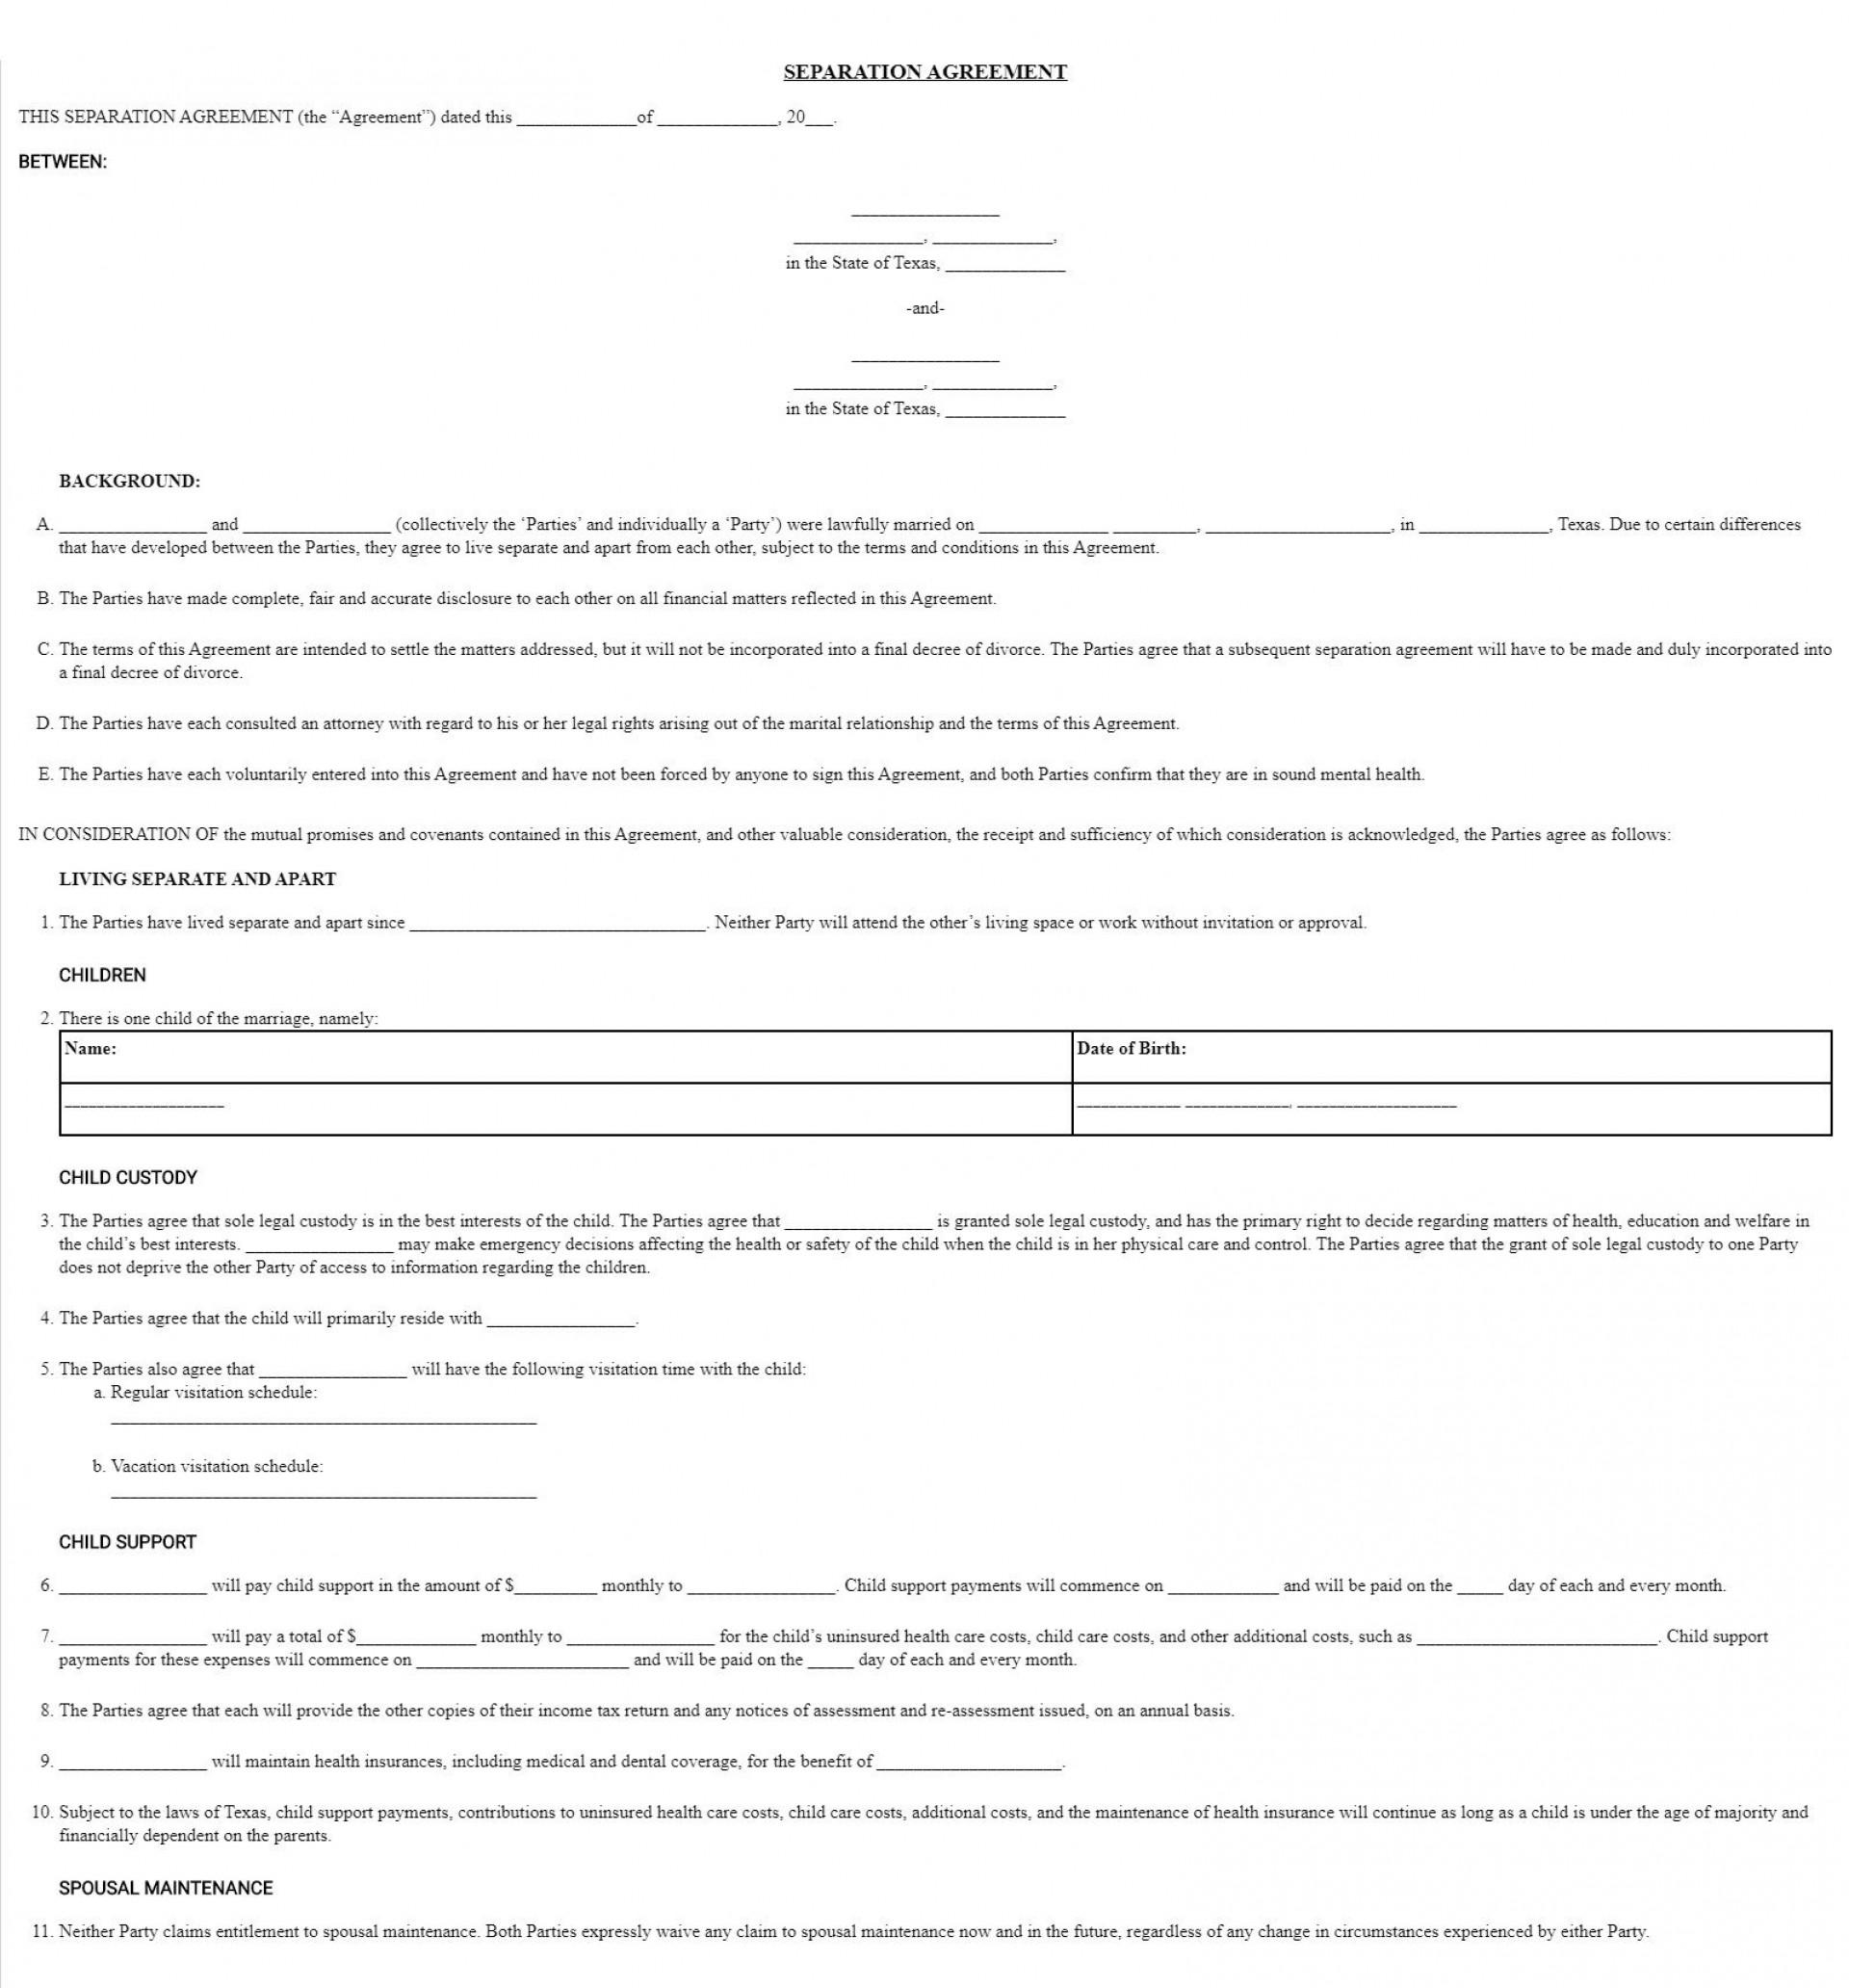 008 Frightening Divorce Settlement Agreement Template Highest Quality  Sample New York Marital Uk South Africa1920